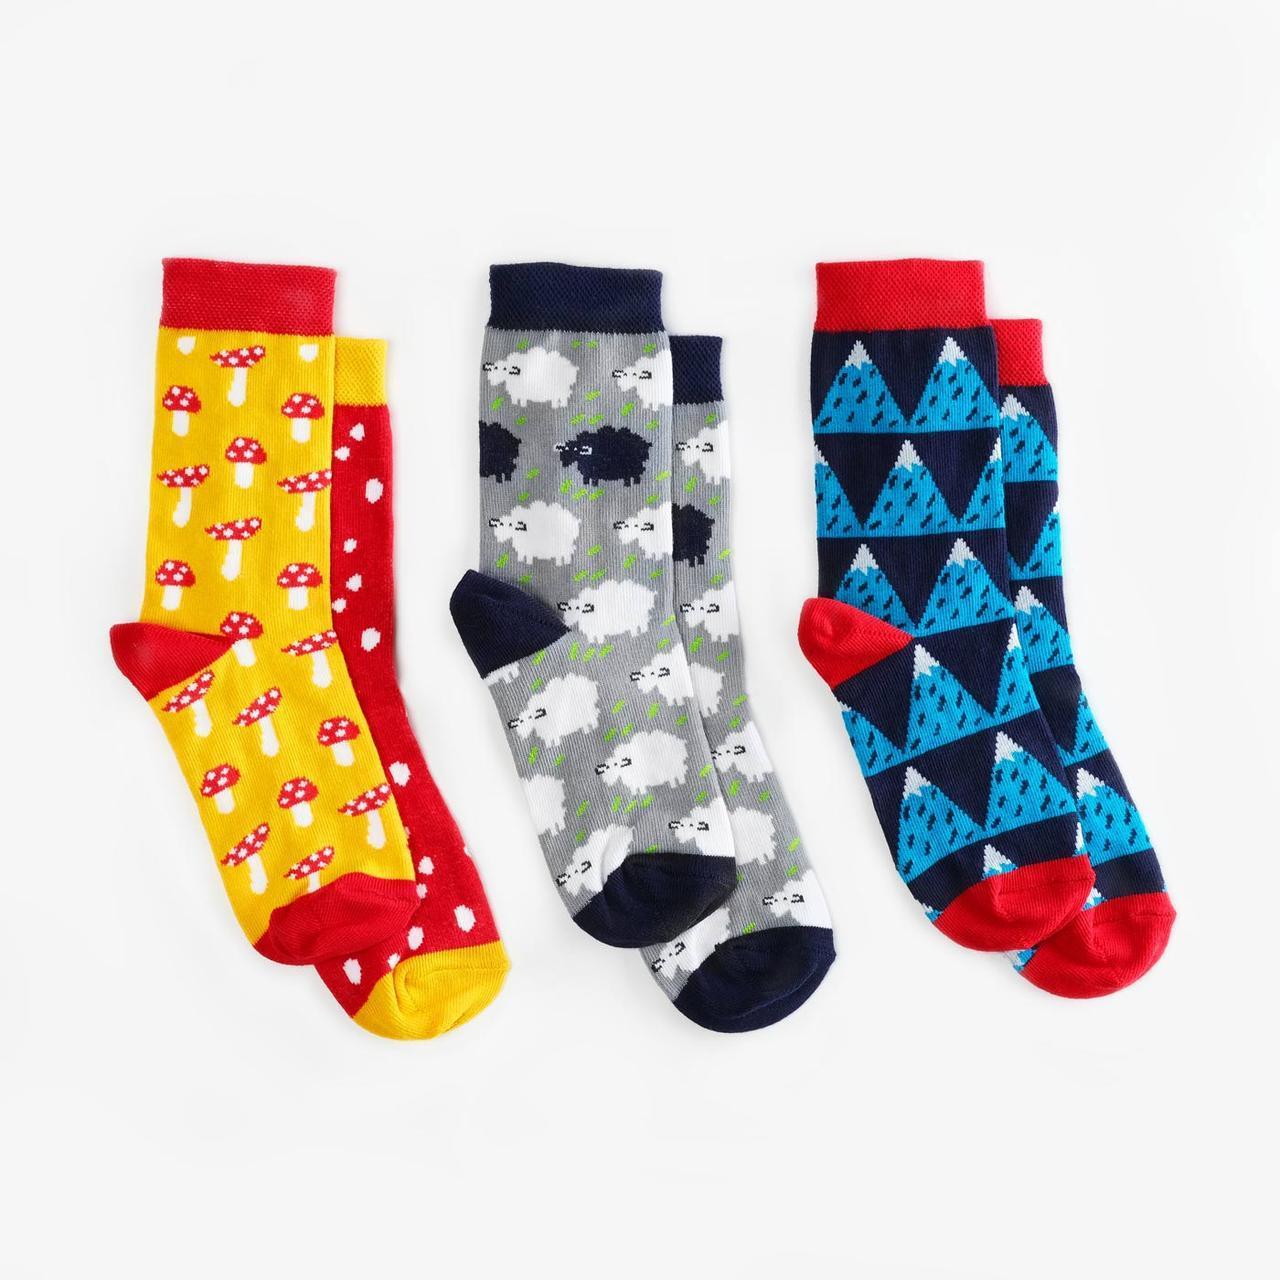 Носки детские Dodo Socks набор Yukon 7-10 лет